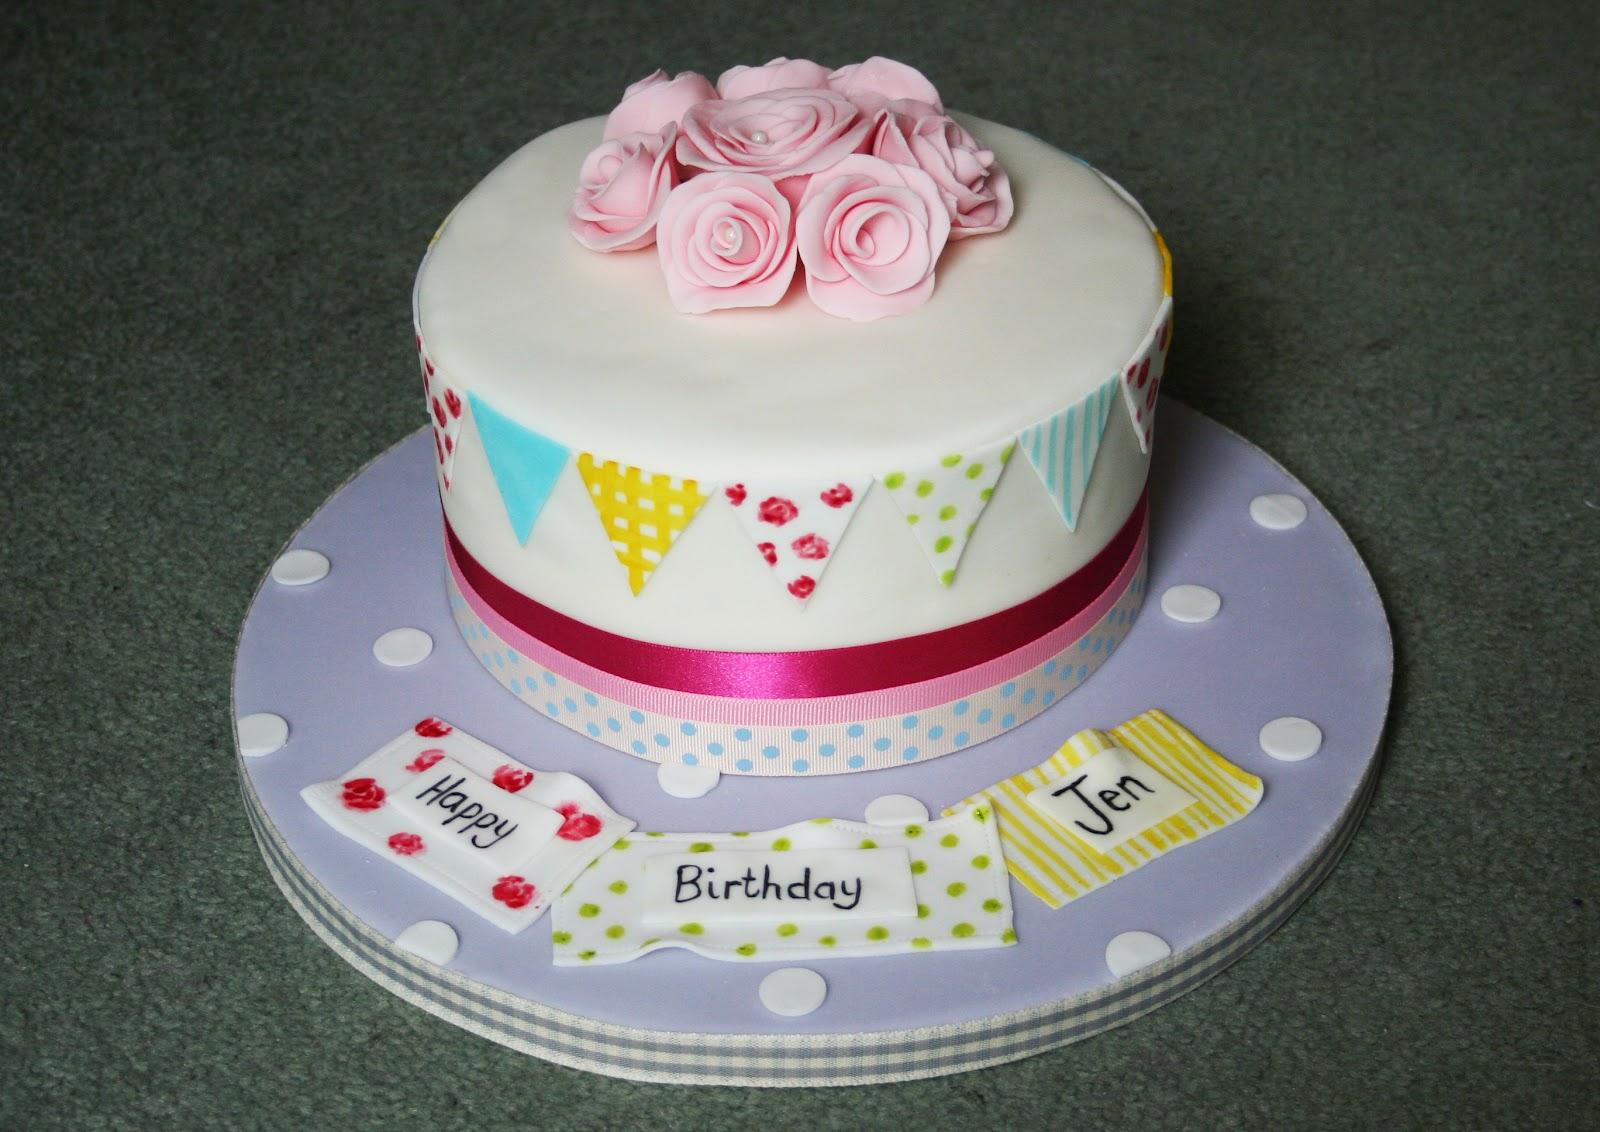 Dann Good Cake Bunting Birthday Cake